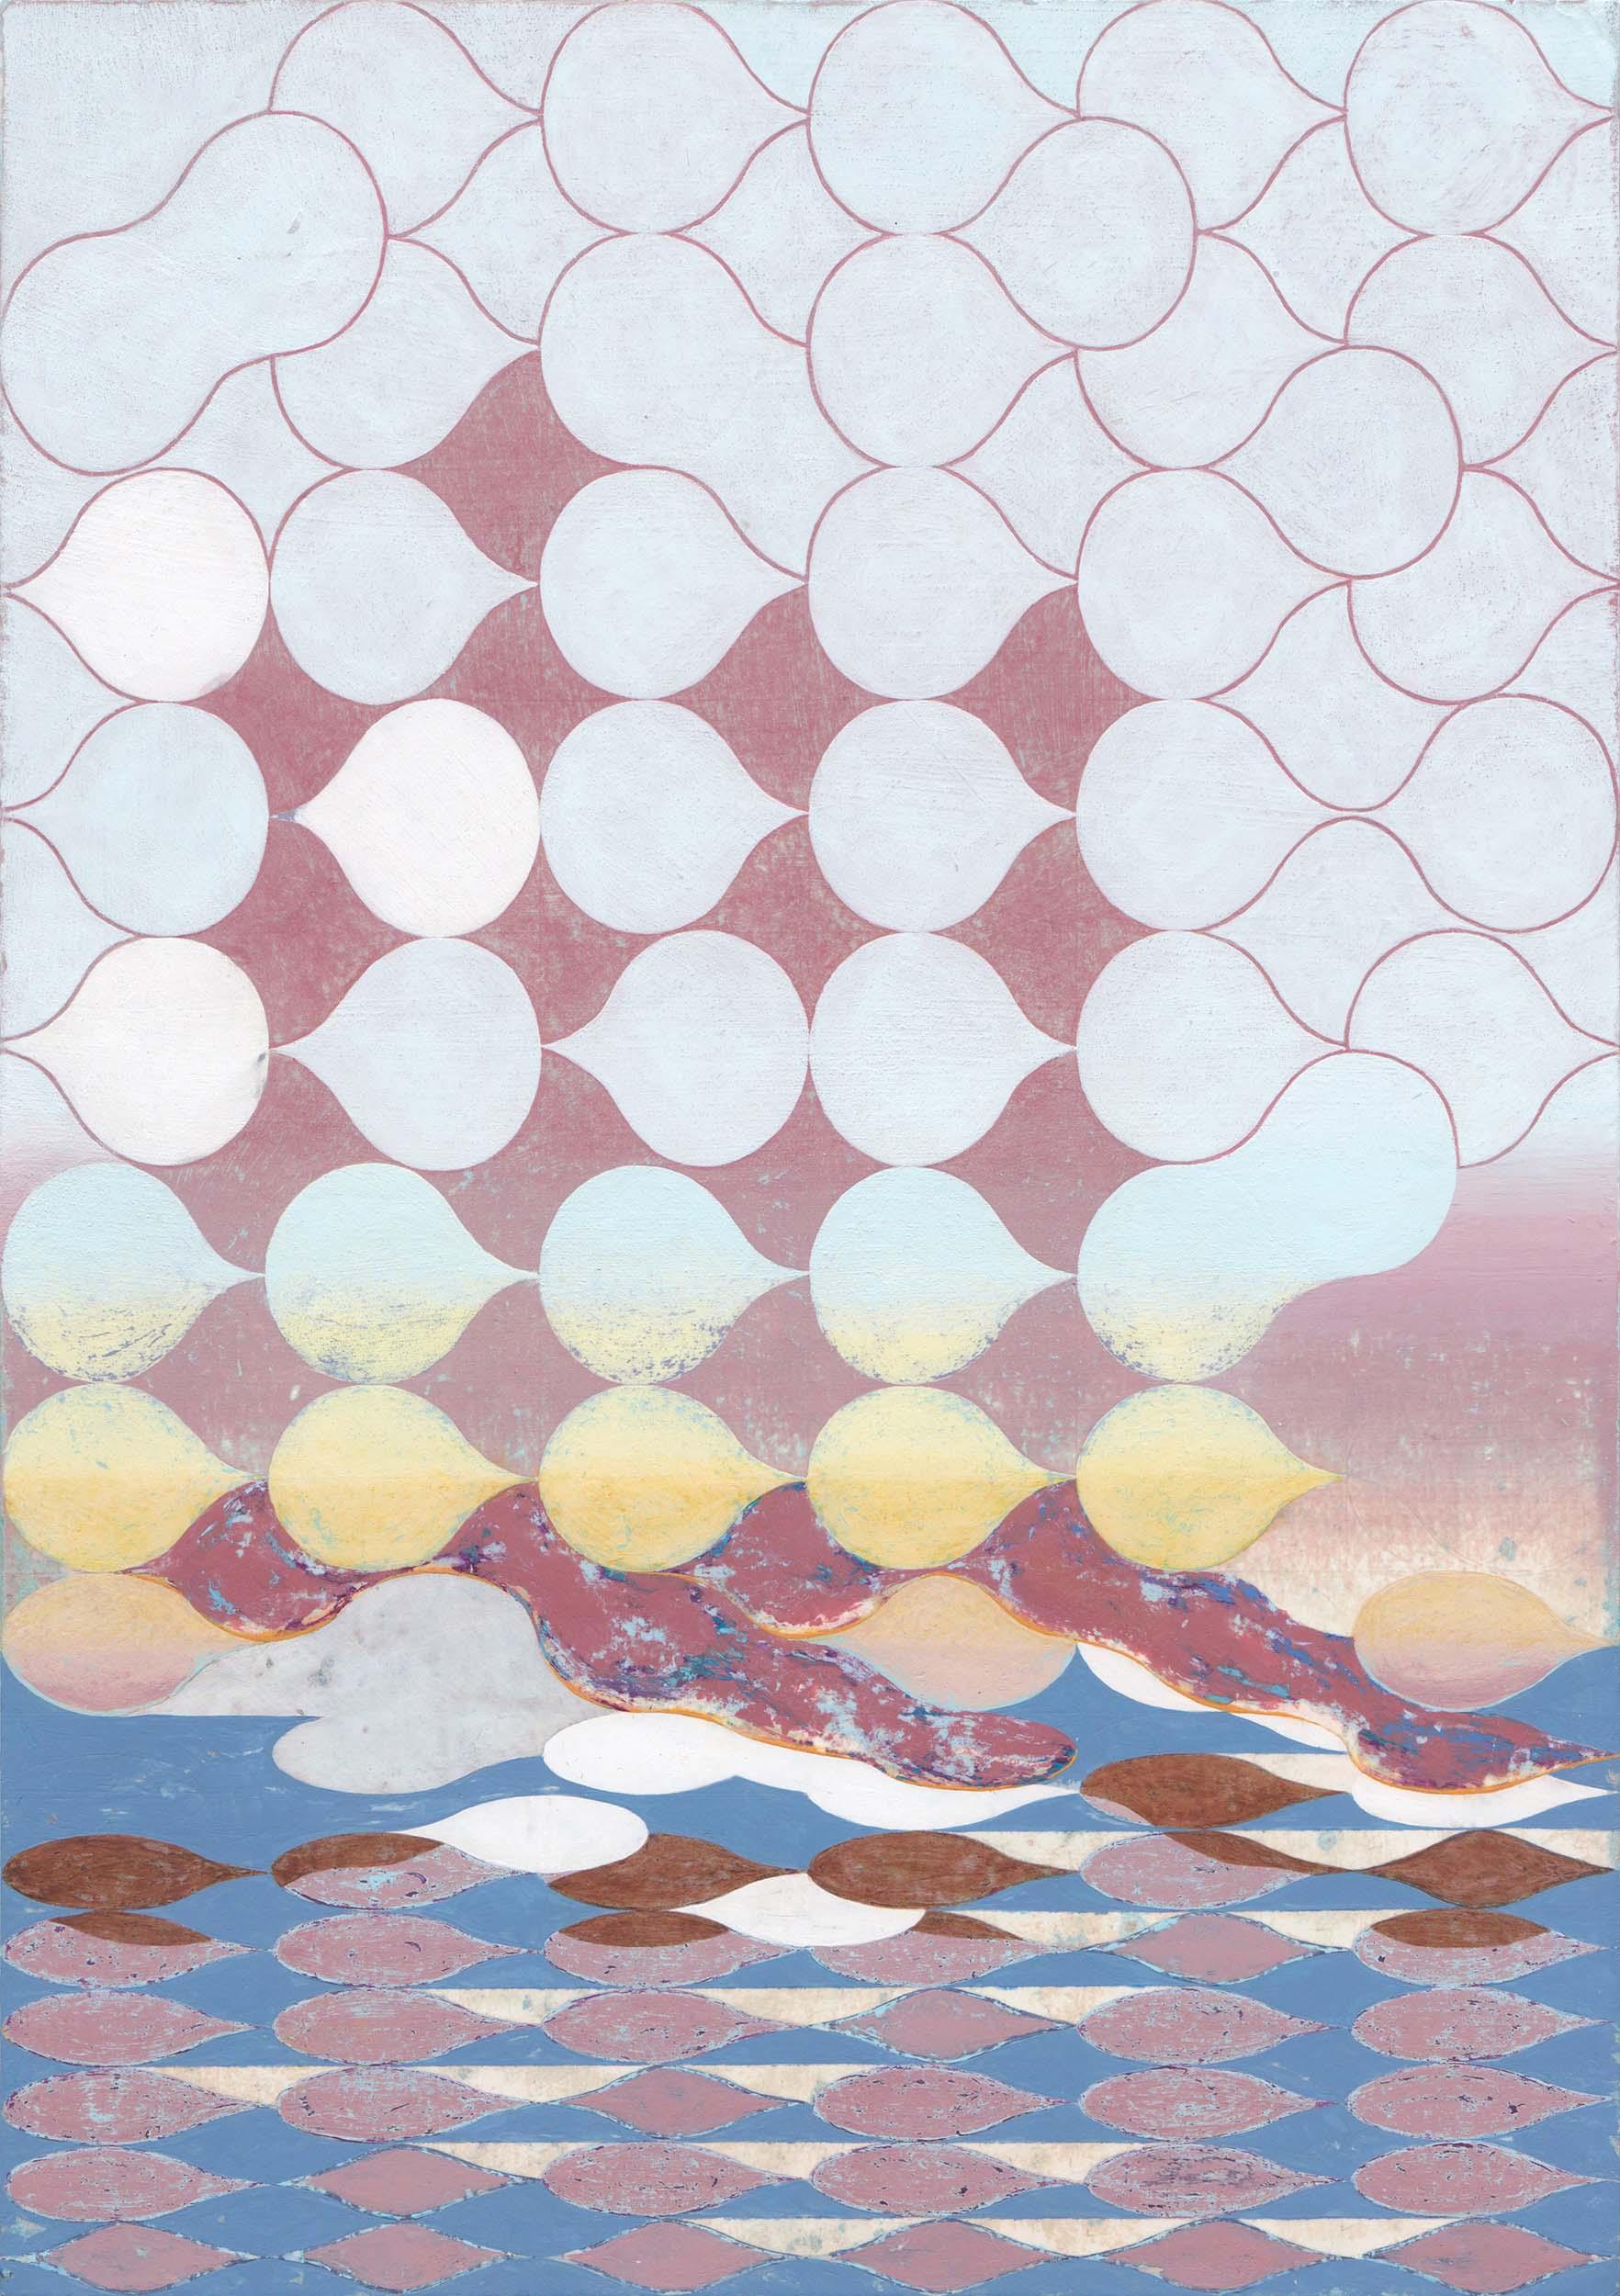 Jinyong Park, aːsks, Acrylic on paper, 29.7 x 21 cm, 2018